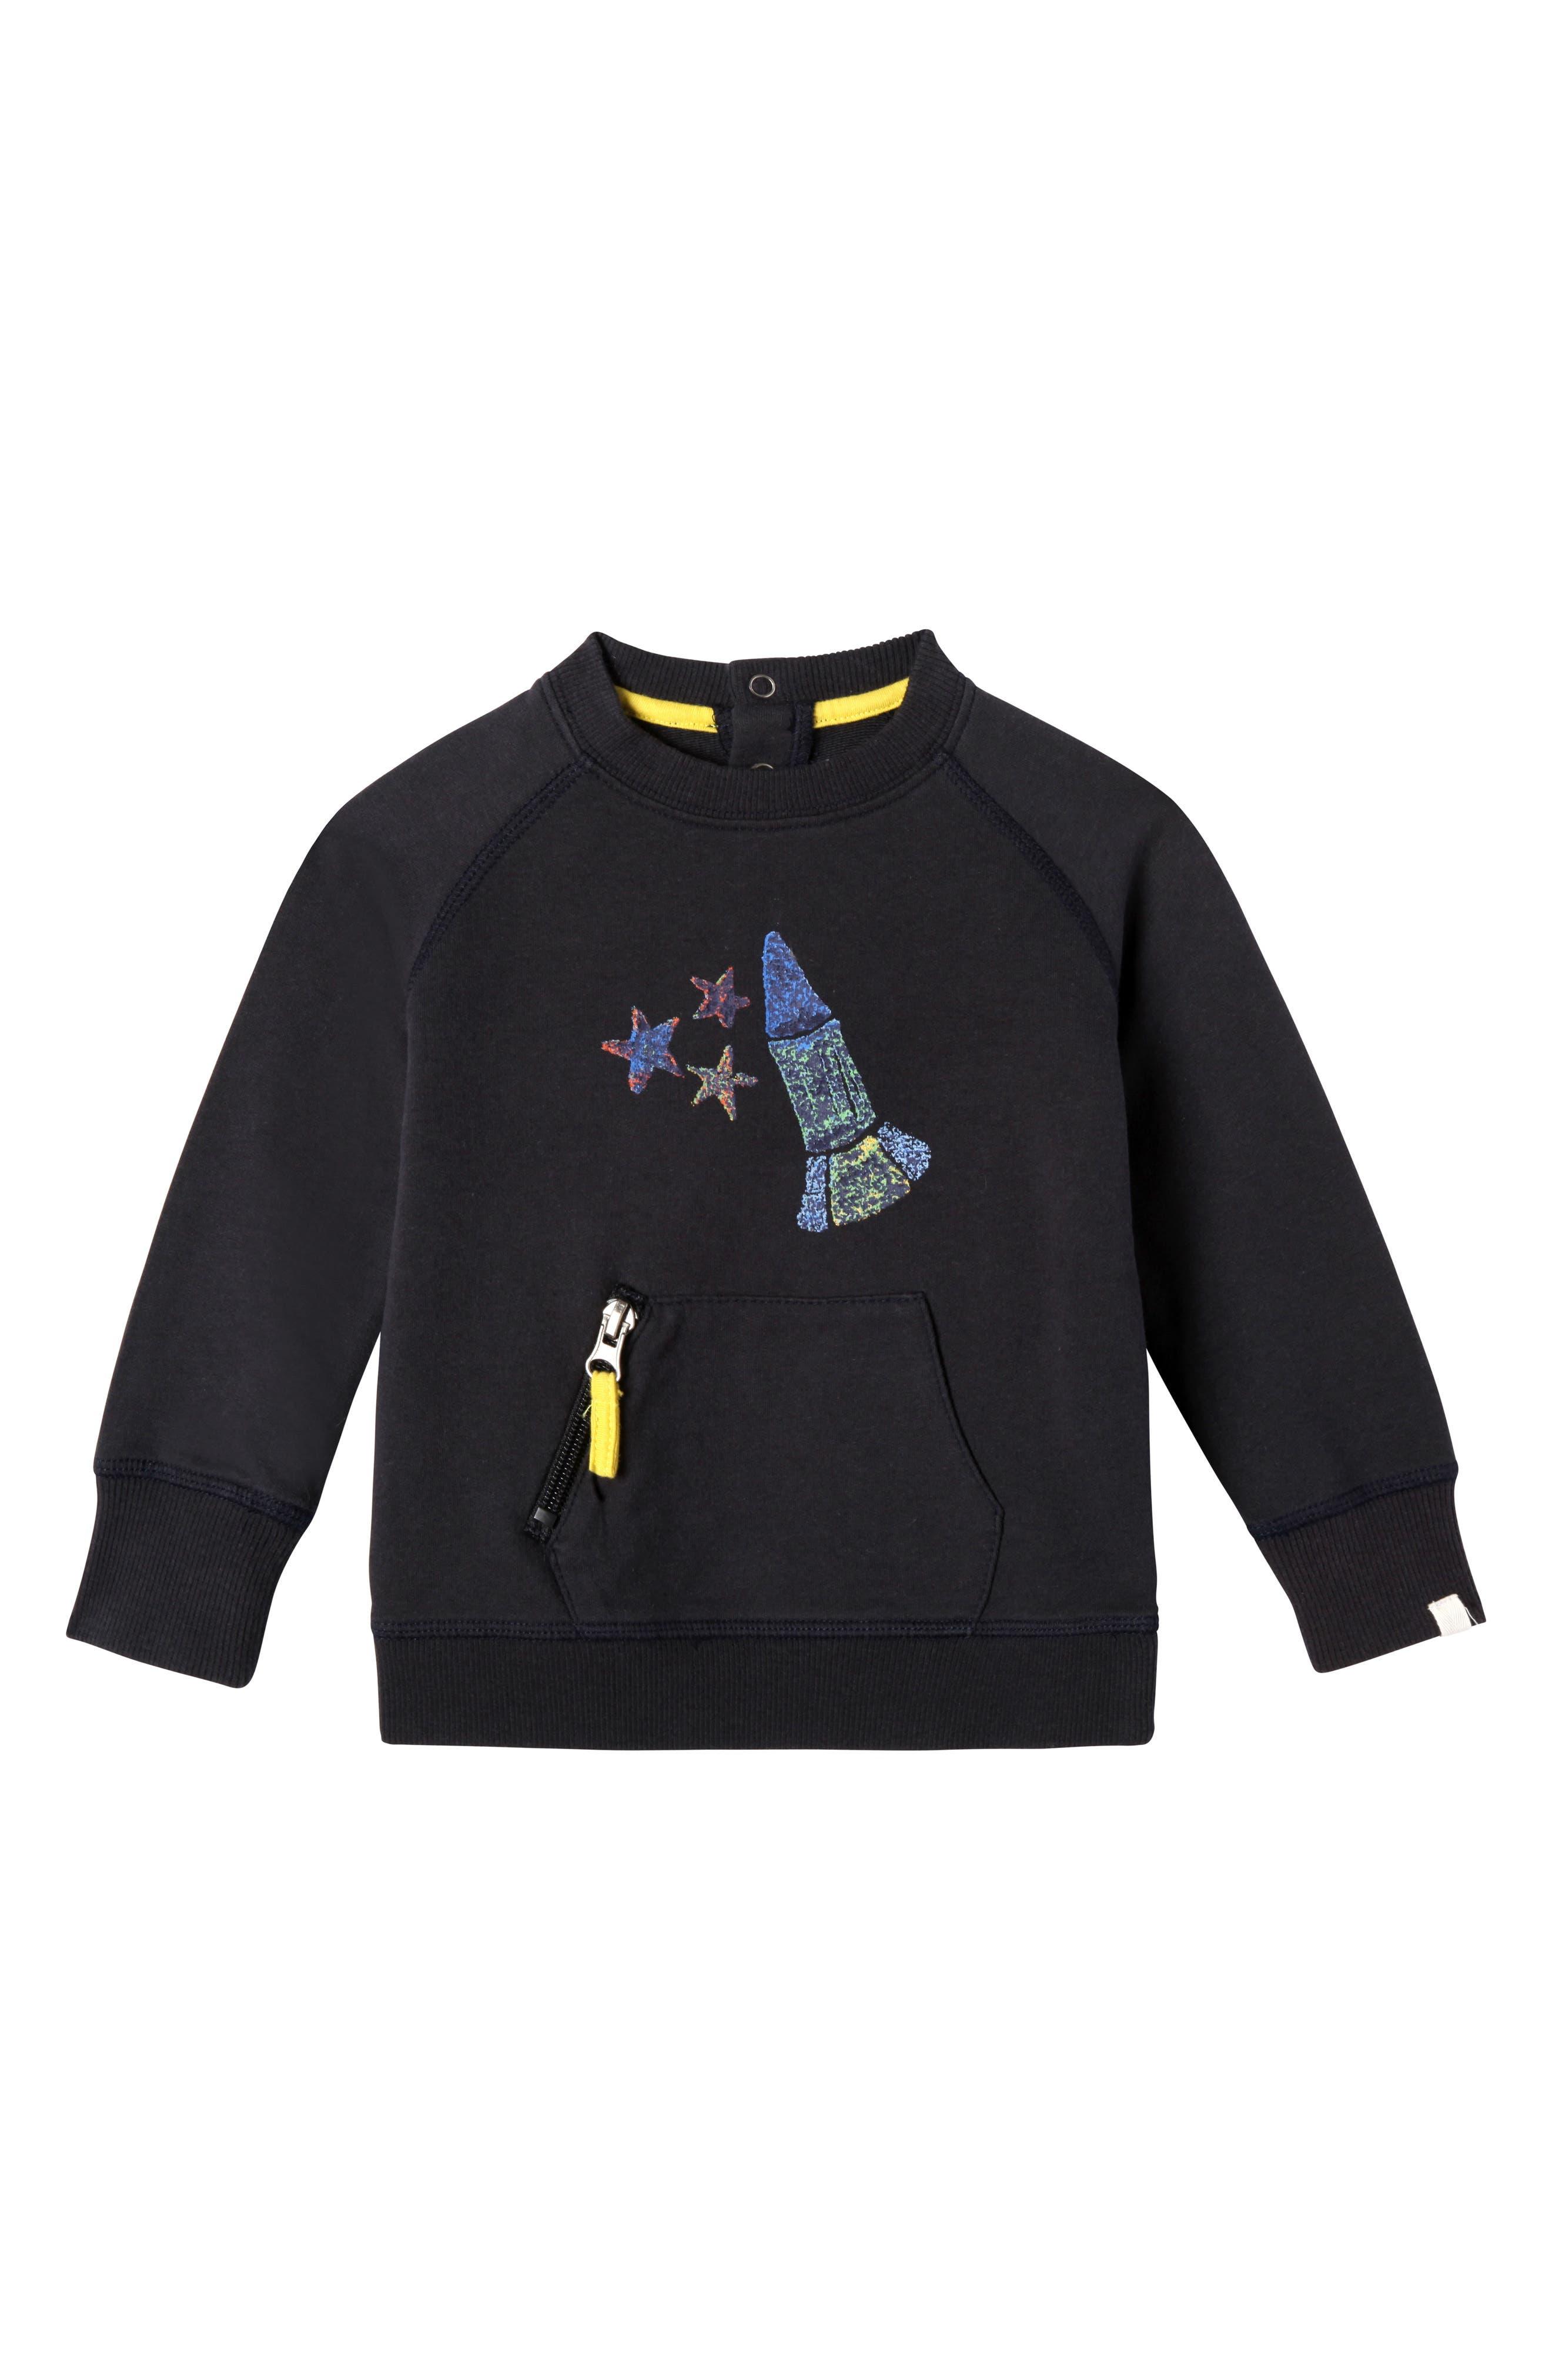 Alternate Image 1 Selected - Art & Eden Jaxon Organic Cotton Sweatshirt (Baby Boys)